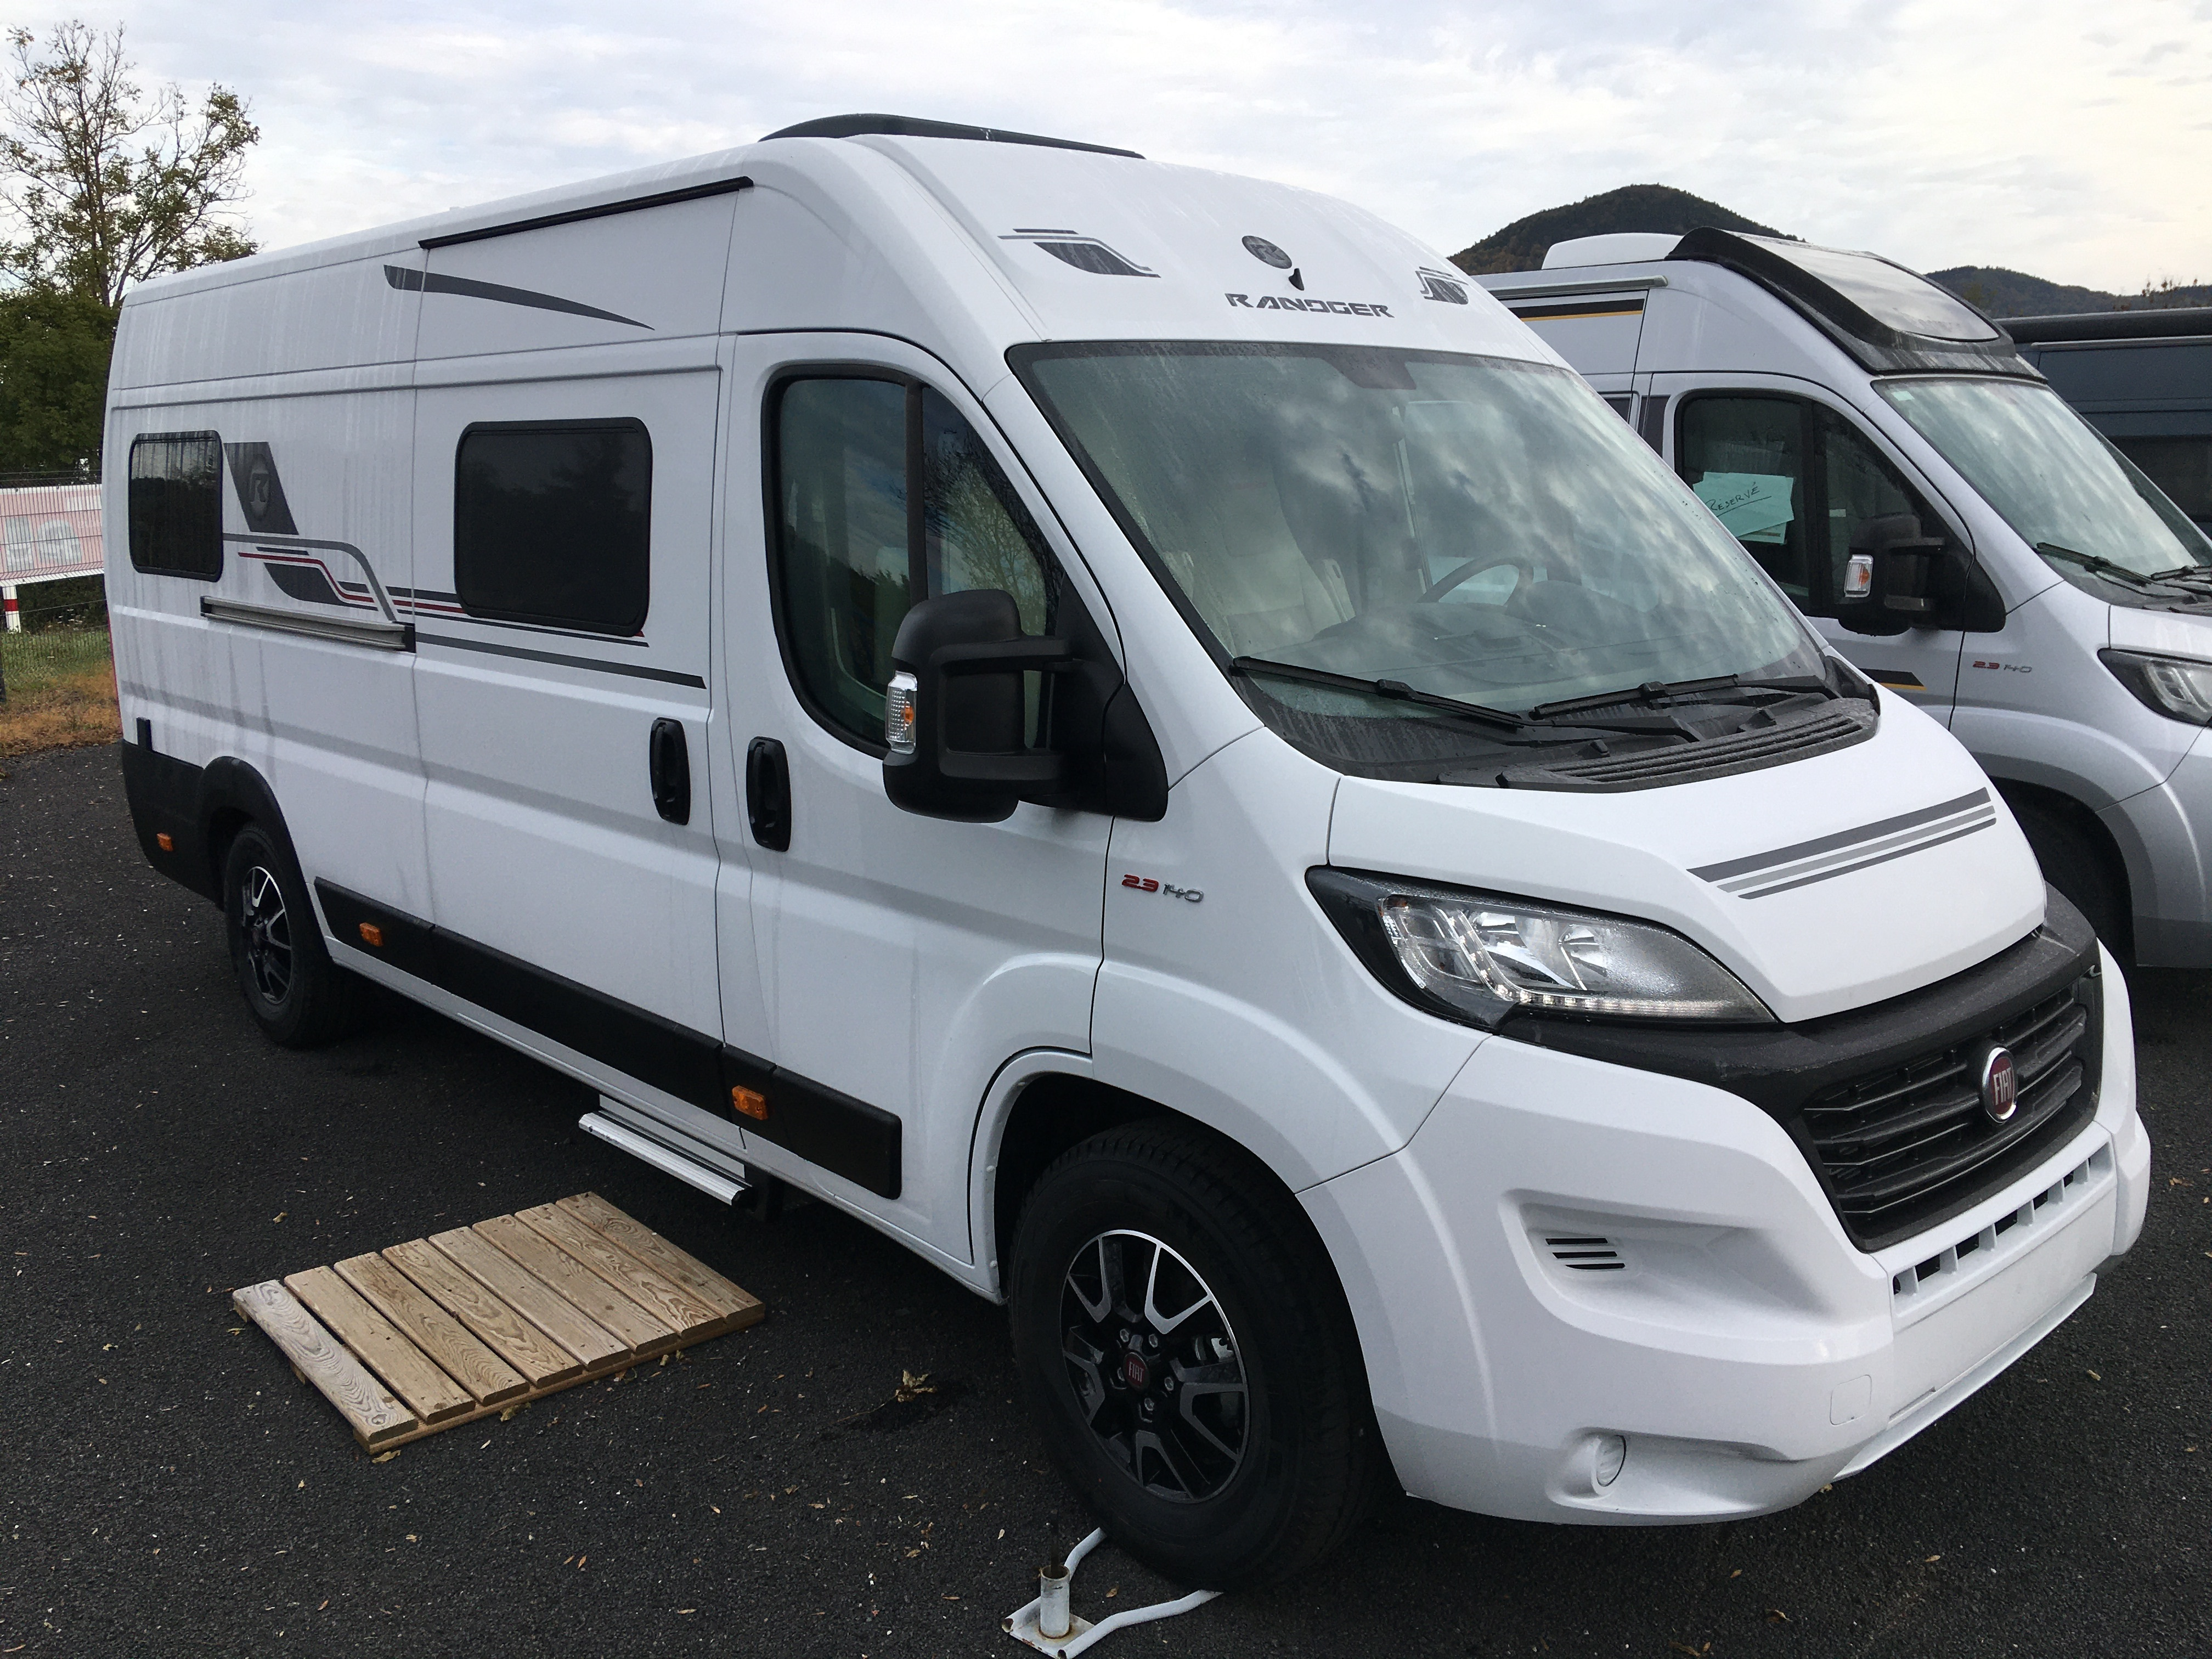 Camping-car RANDGER R640 160ch BVA ( en commande)